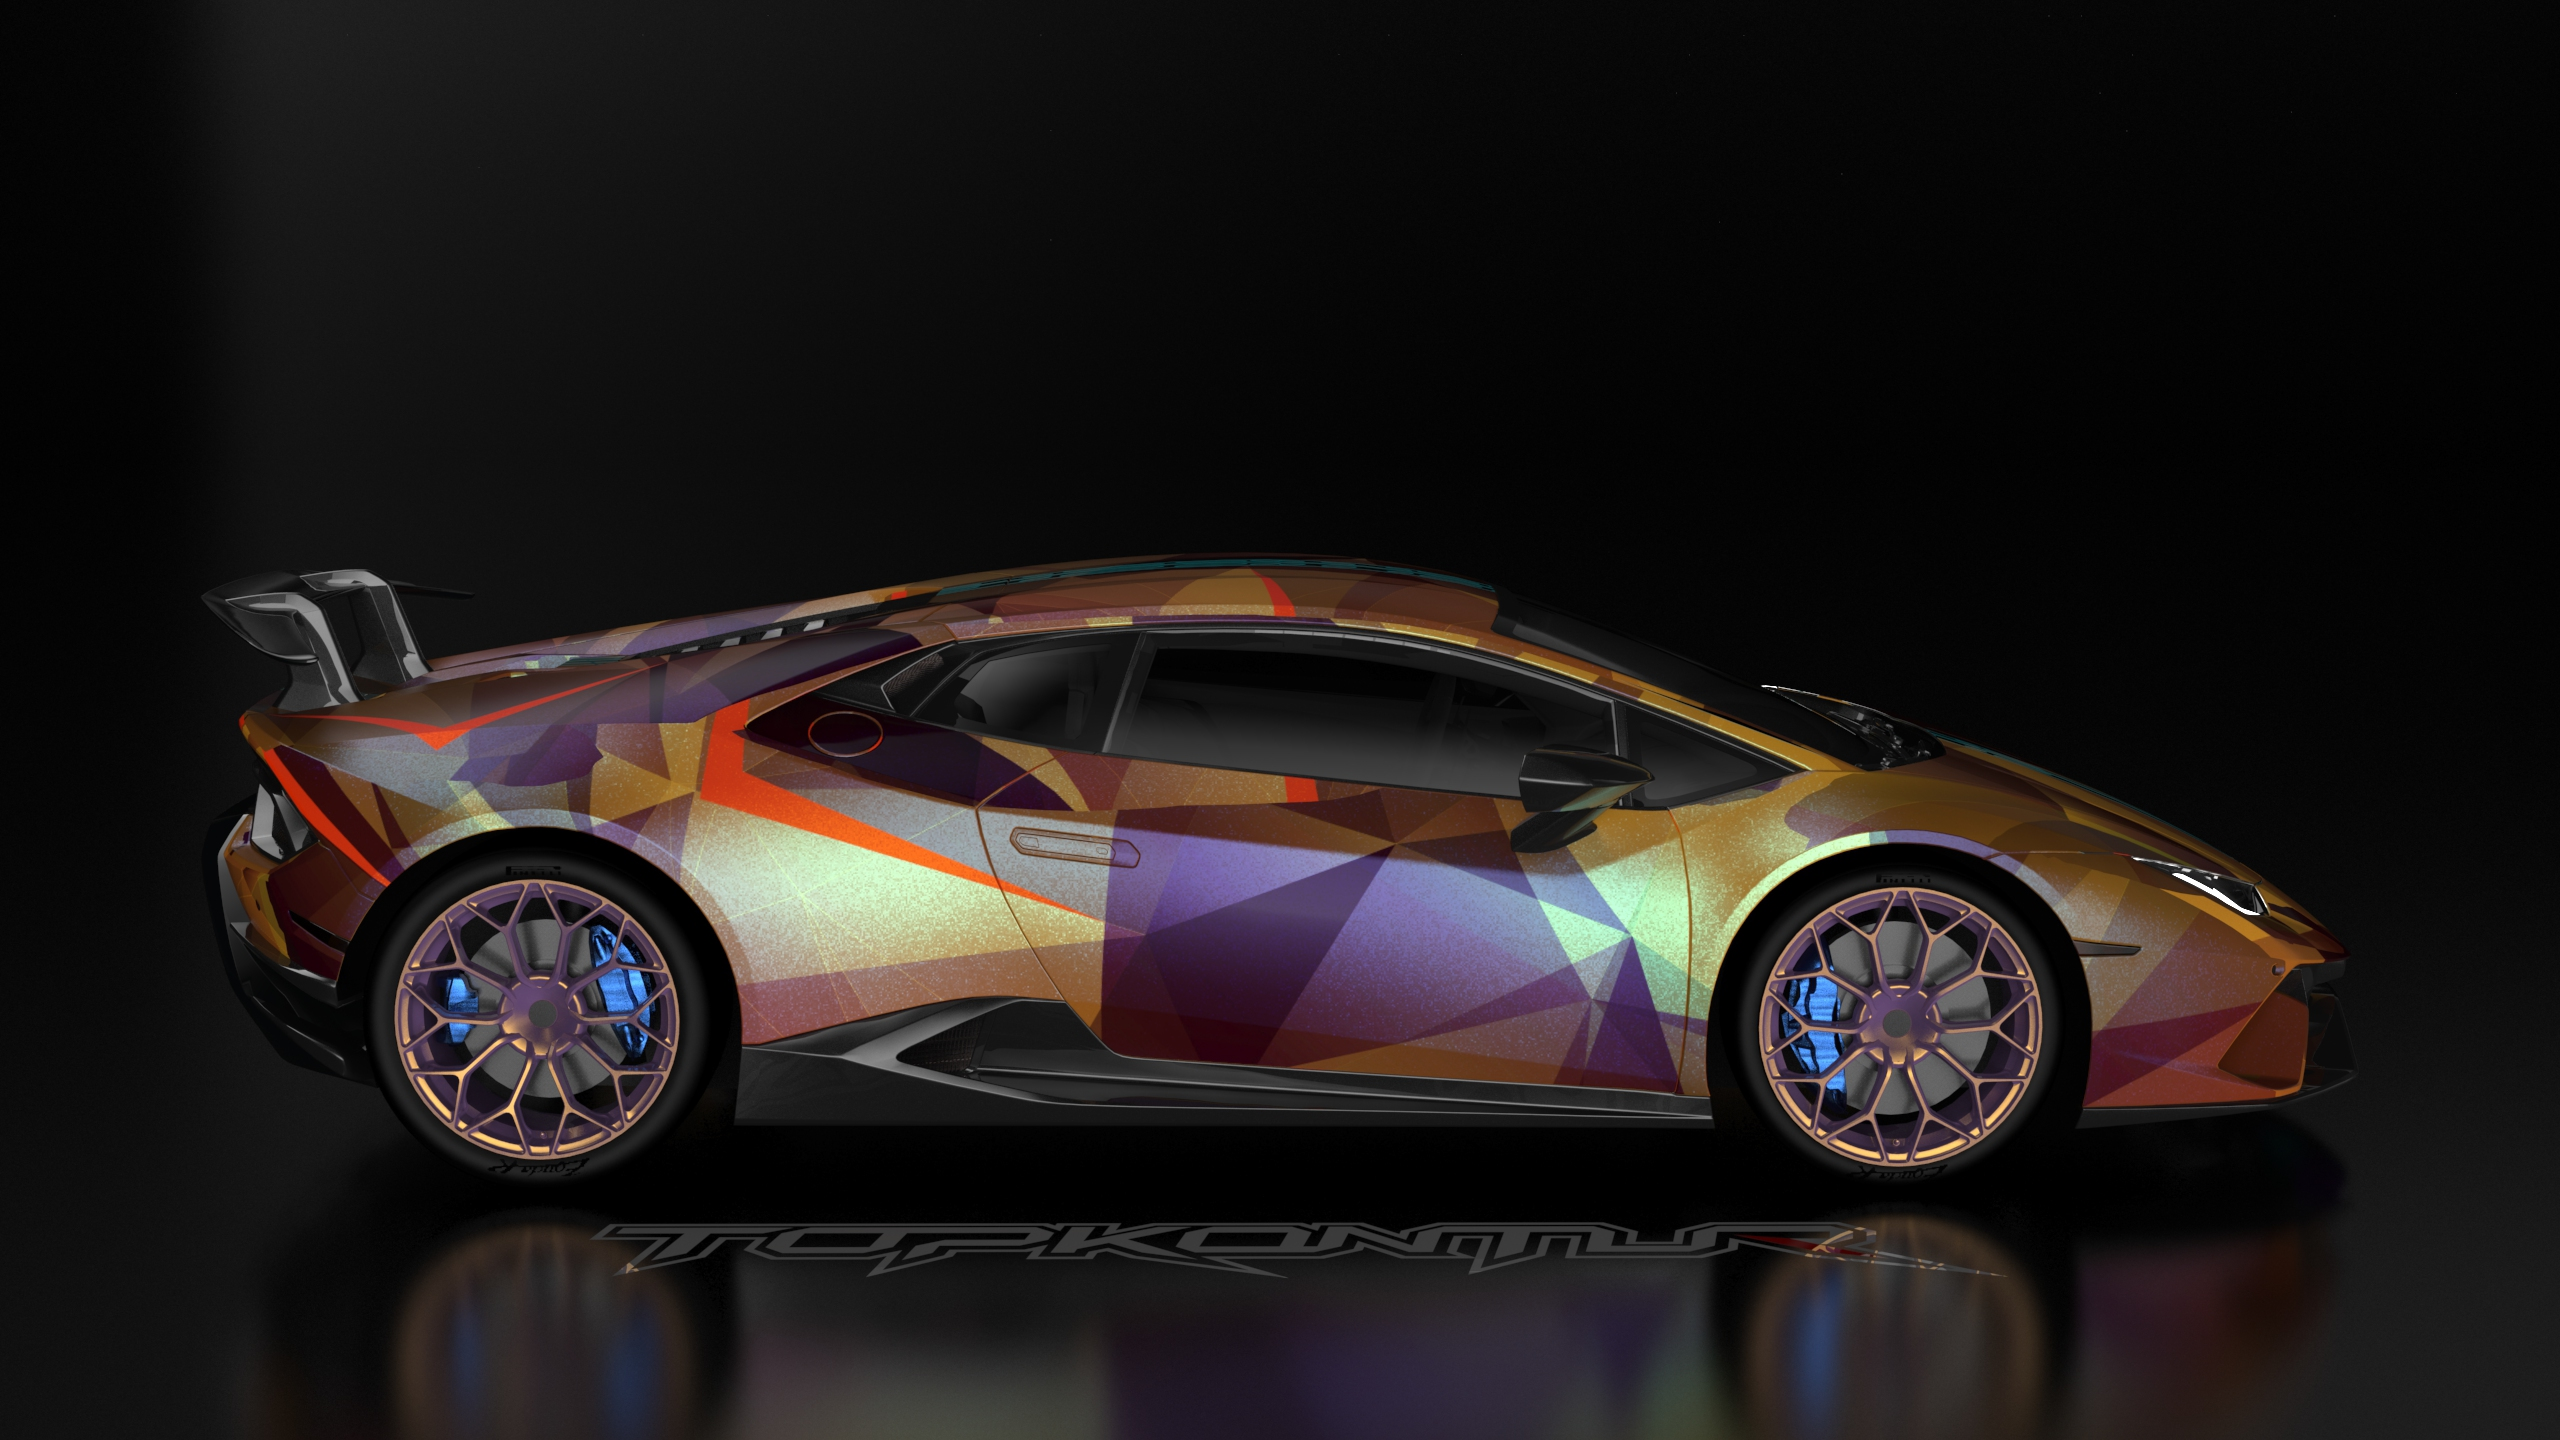 640x1136 Gold And Wine Lamborghini Huracan Car Iphone 5 5c